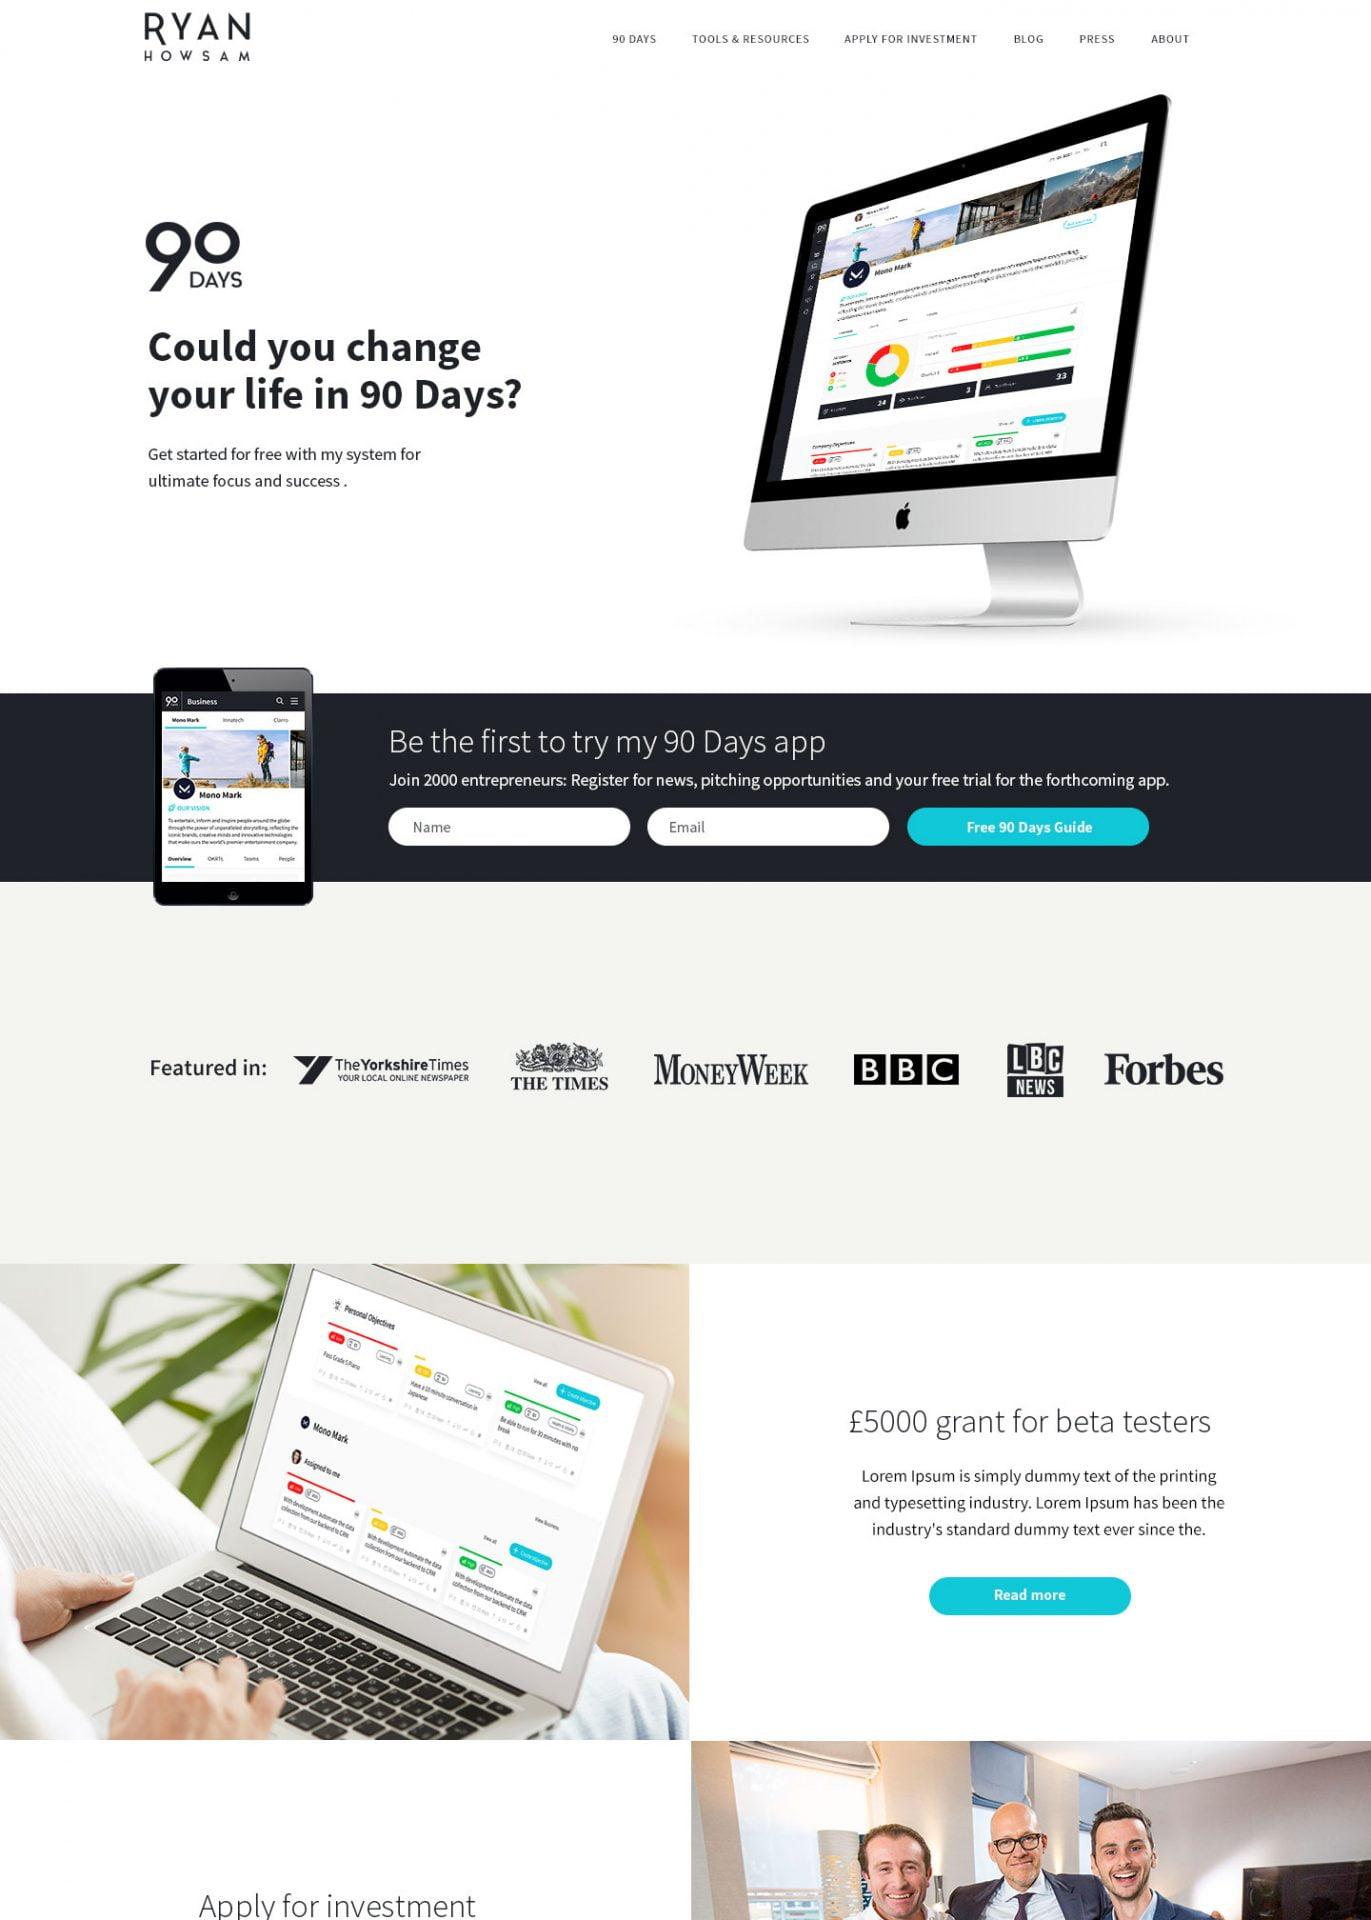 Ryan Howsam Personal Website Design